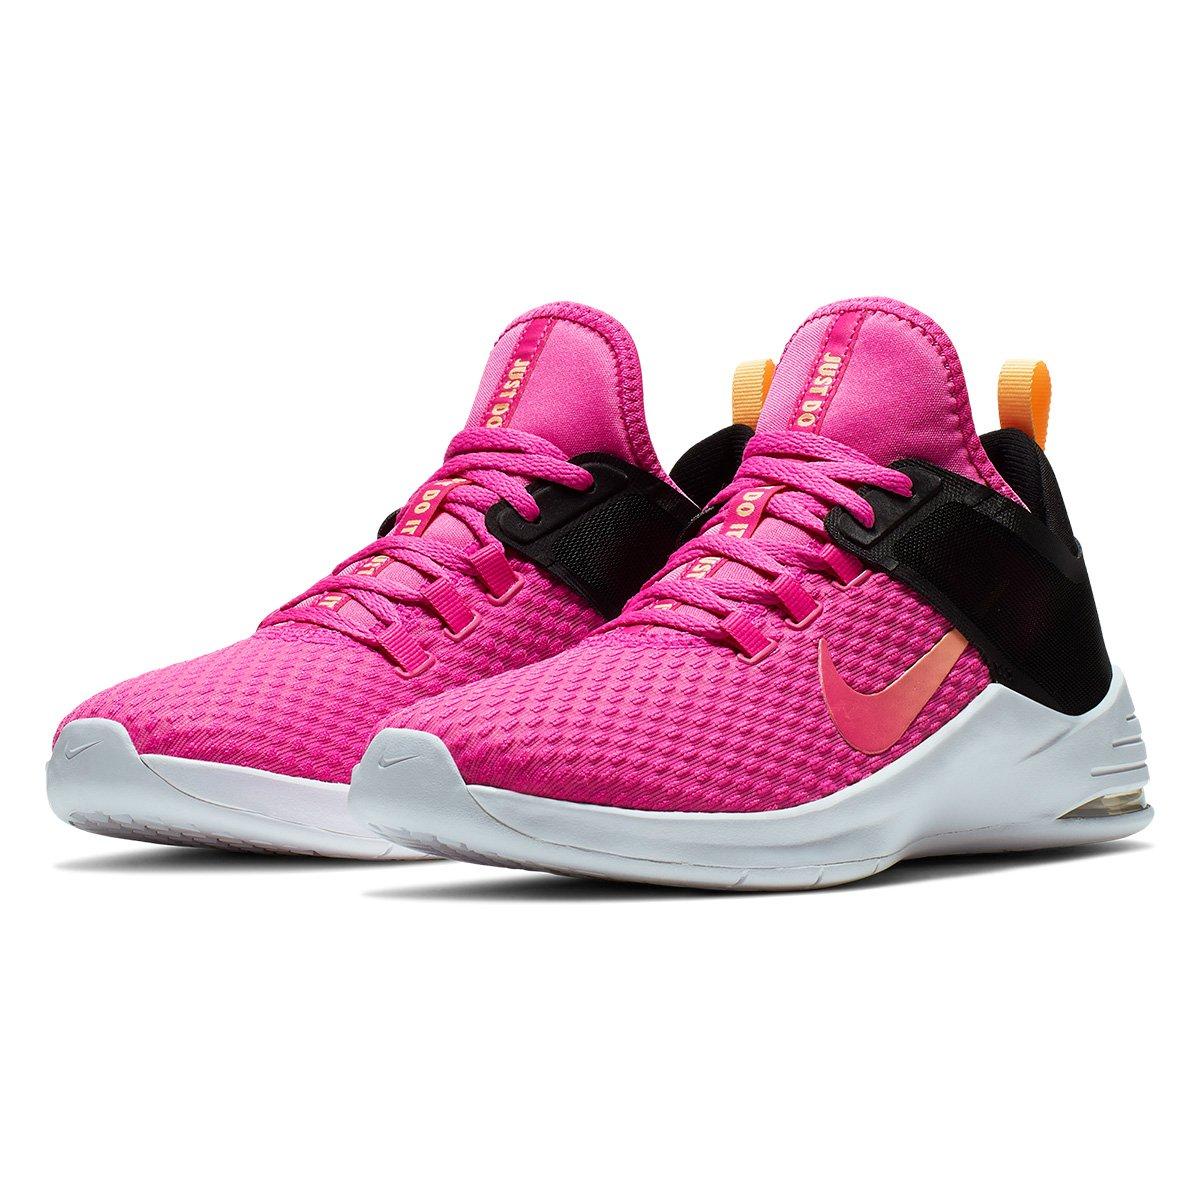 Tênis Nike Air Max Bella Tr 2 Feminino Rosa E Preto